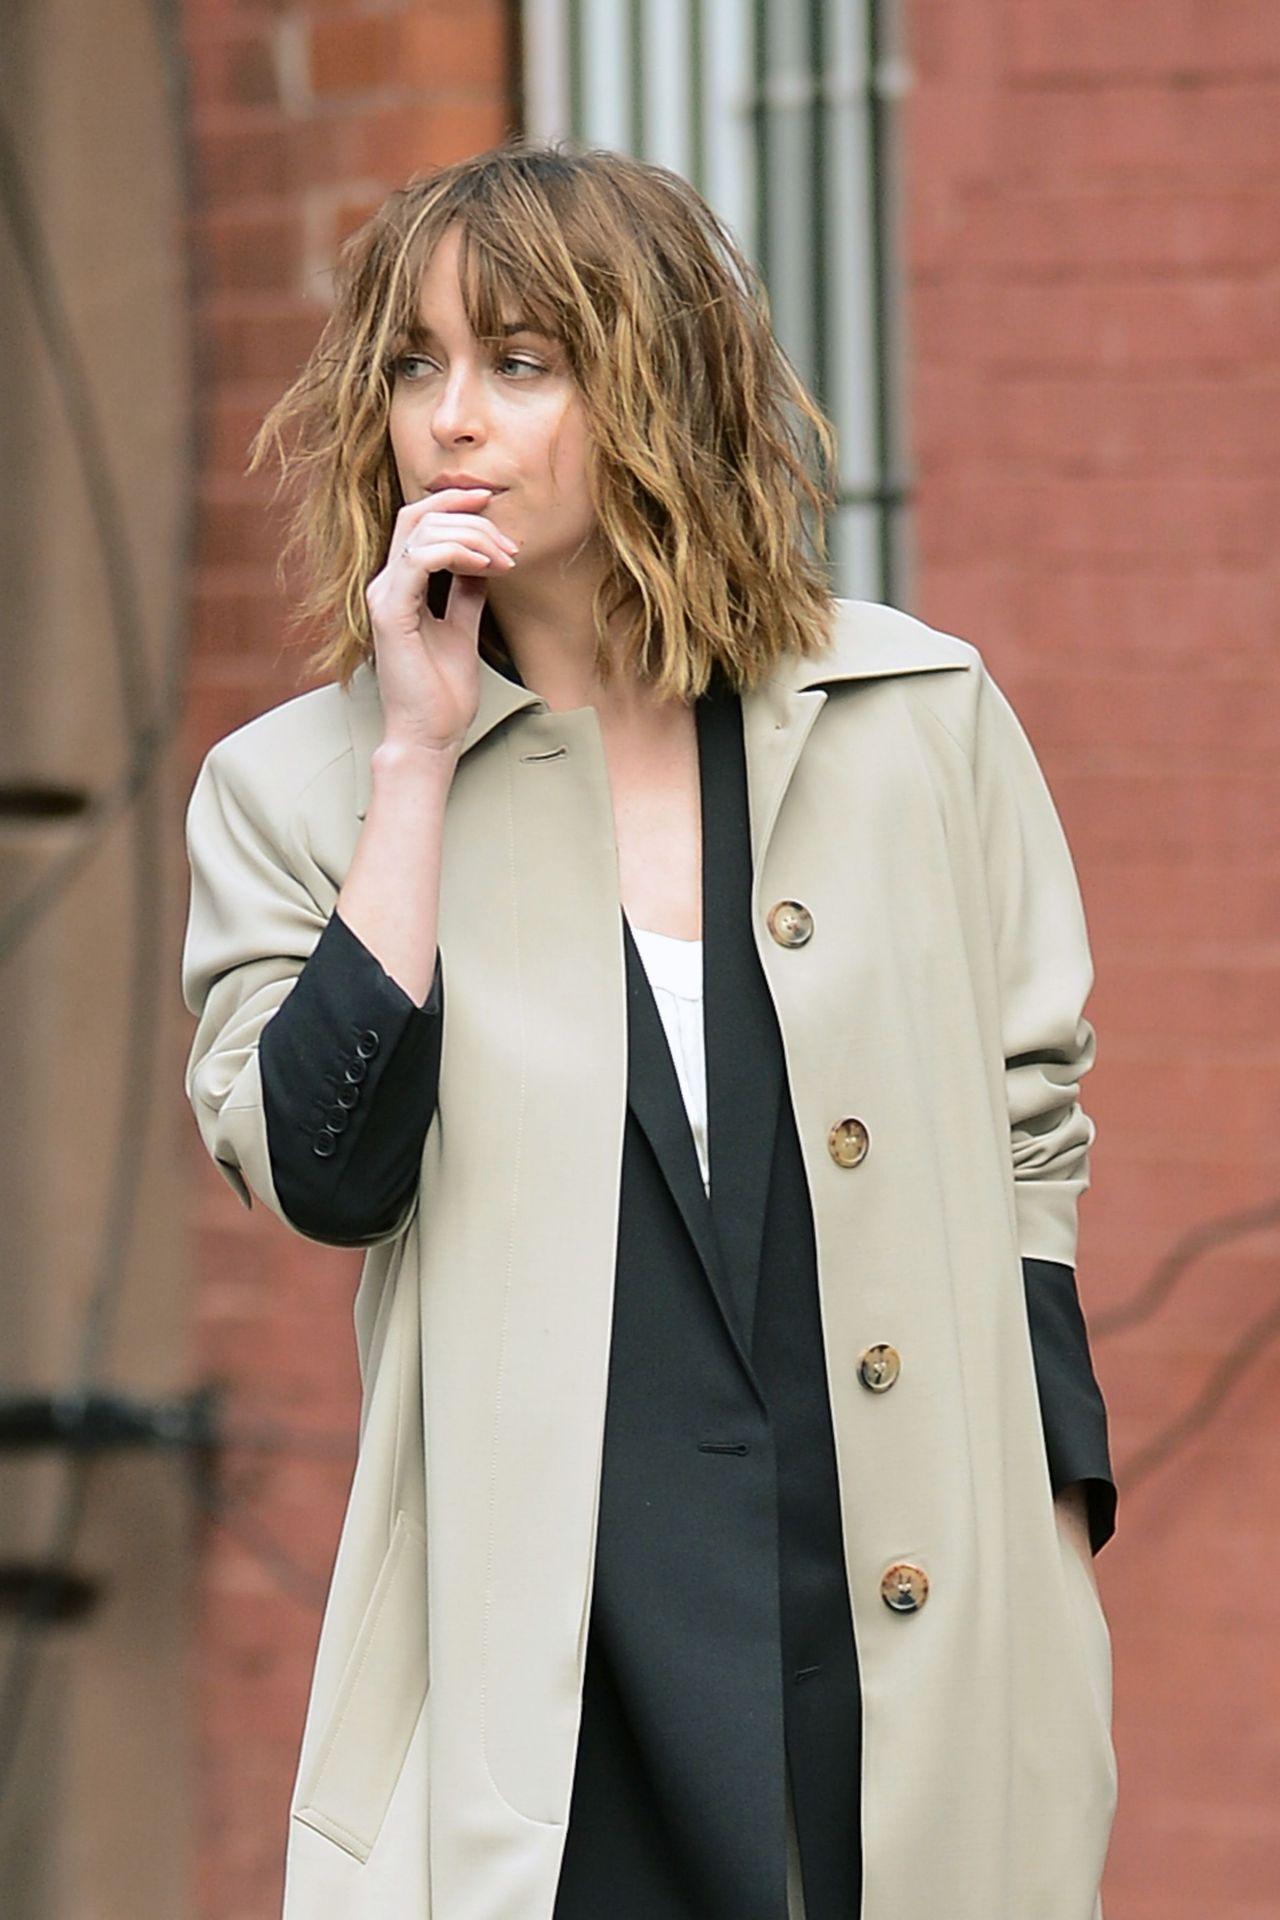 Dakota Johnson Photoshoot In New York City October 2015